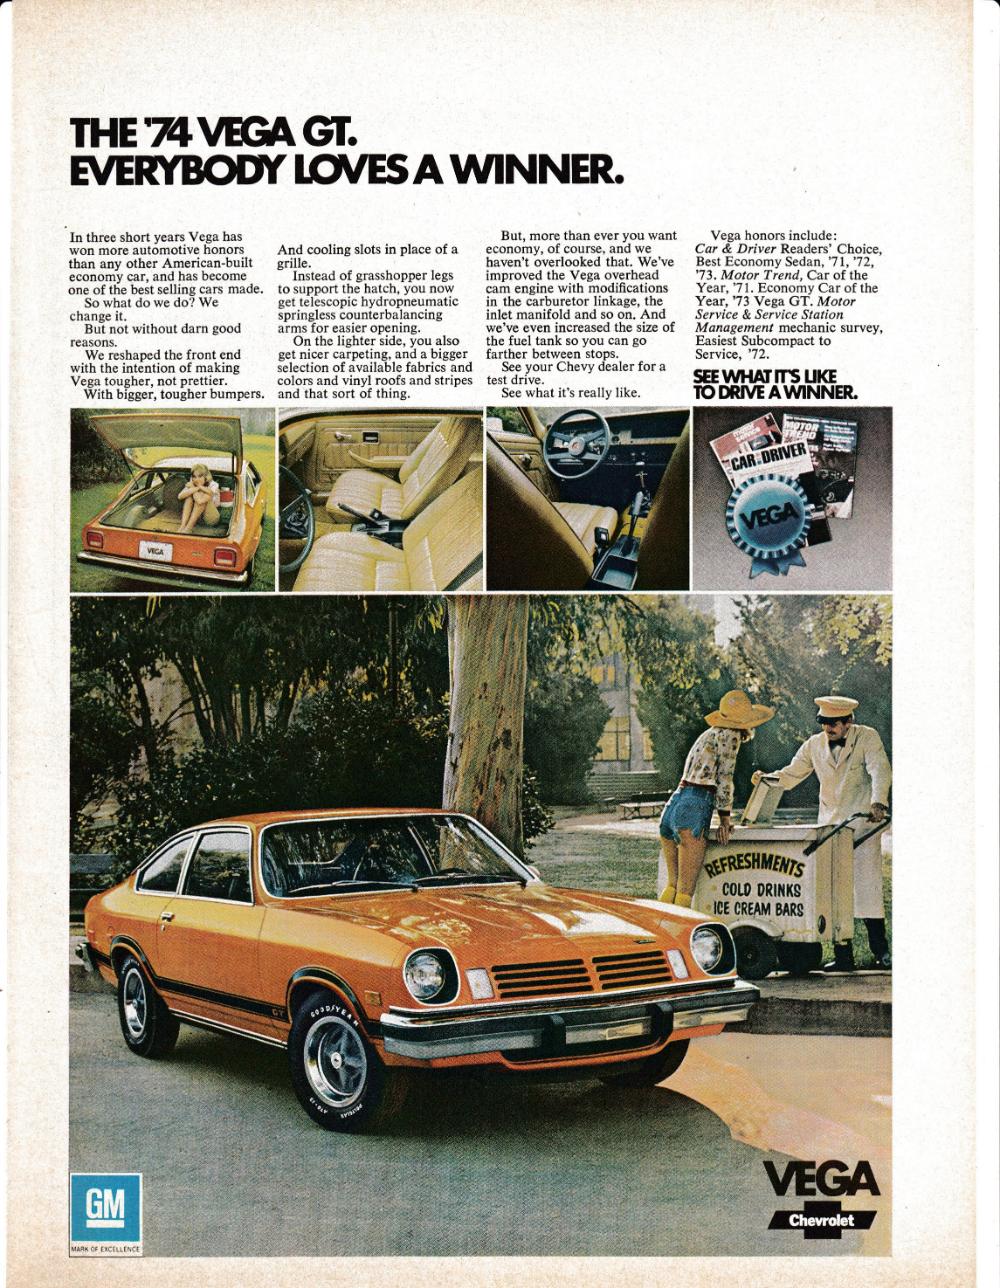 1974 Chevrolet Vega GT-Ice Cream Cart -Drive A Winner-Original Magazine Ad